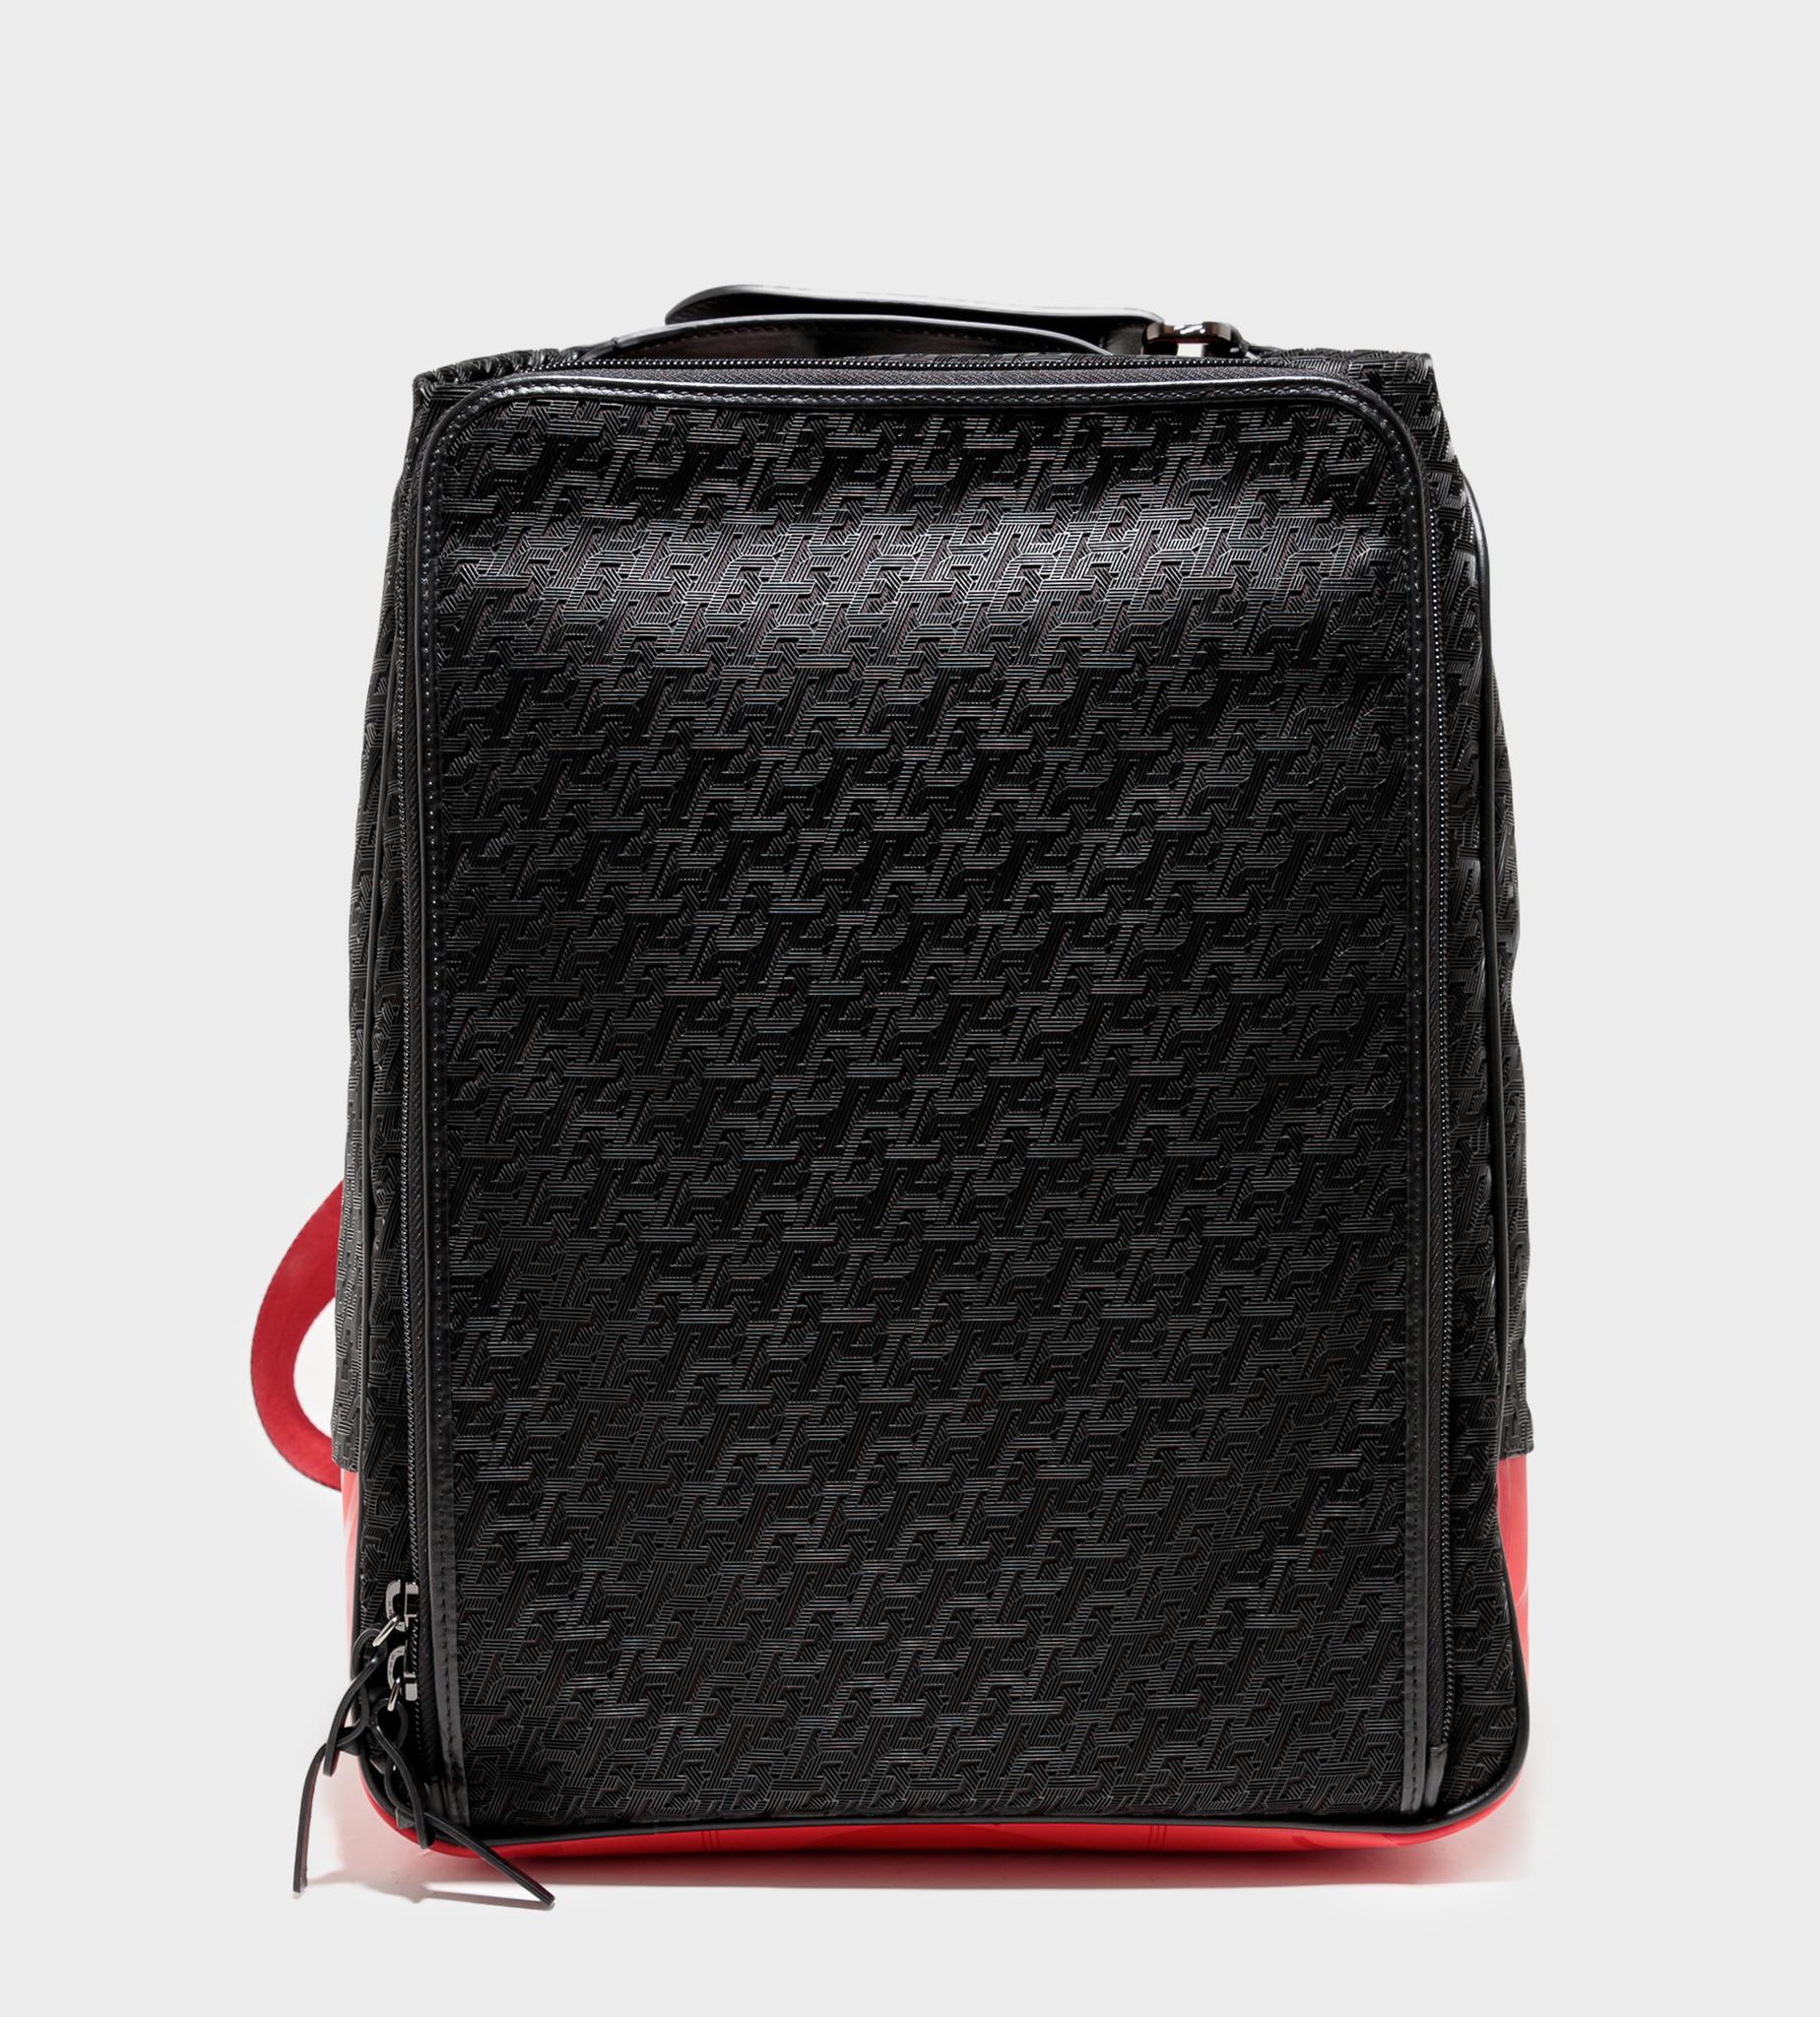 CHRISTIAN LOUBOUTIN Hop'n Zip Backpack Black